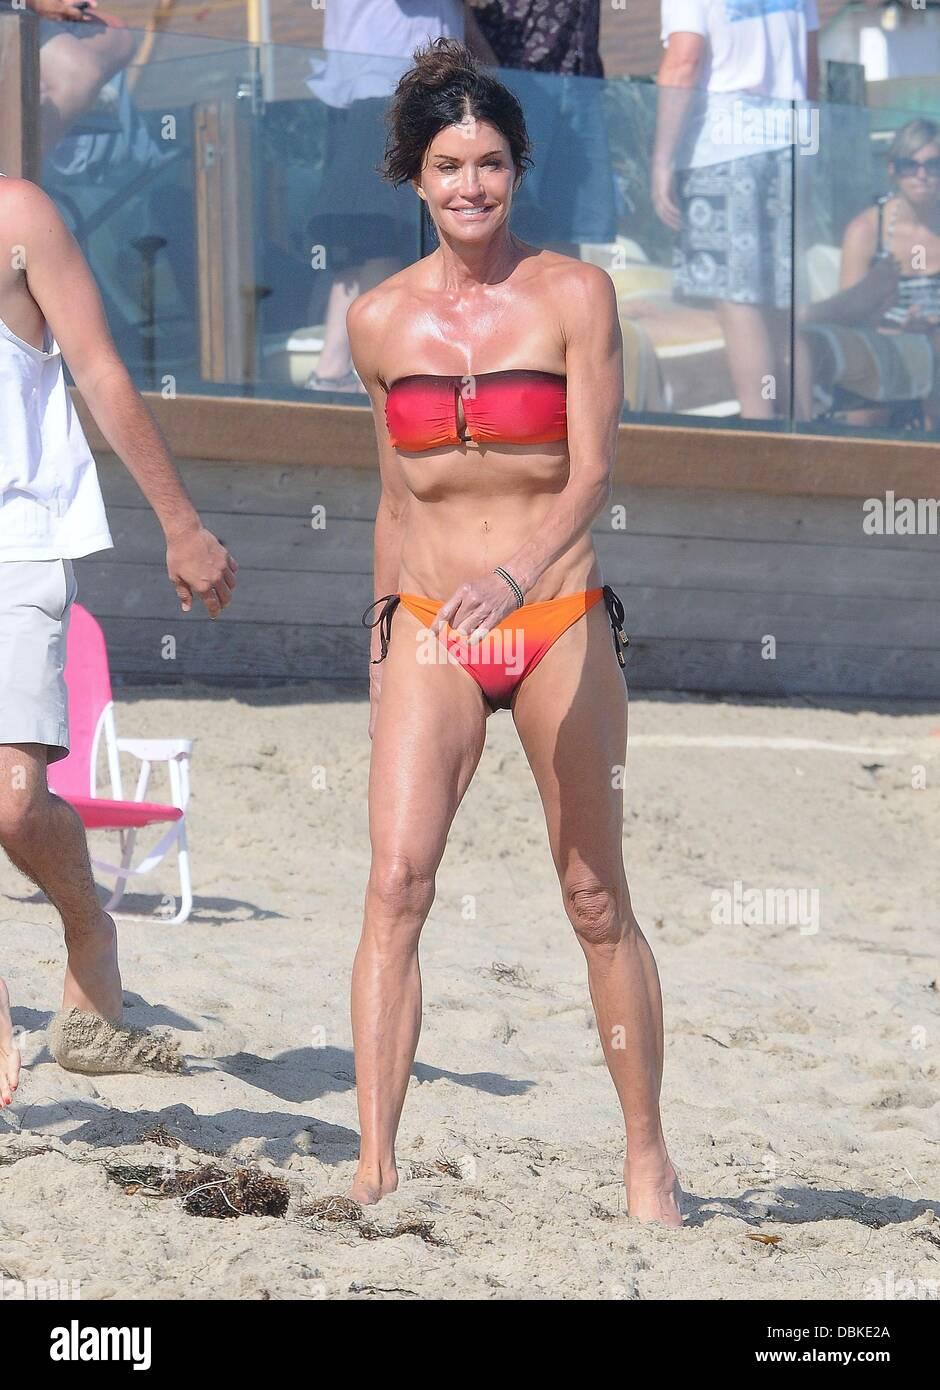 Janice Dickinson celebrating the 4th July Independence Day on the beach in Malibu  Malibu, California- 04.07.11 - Stock Image